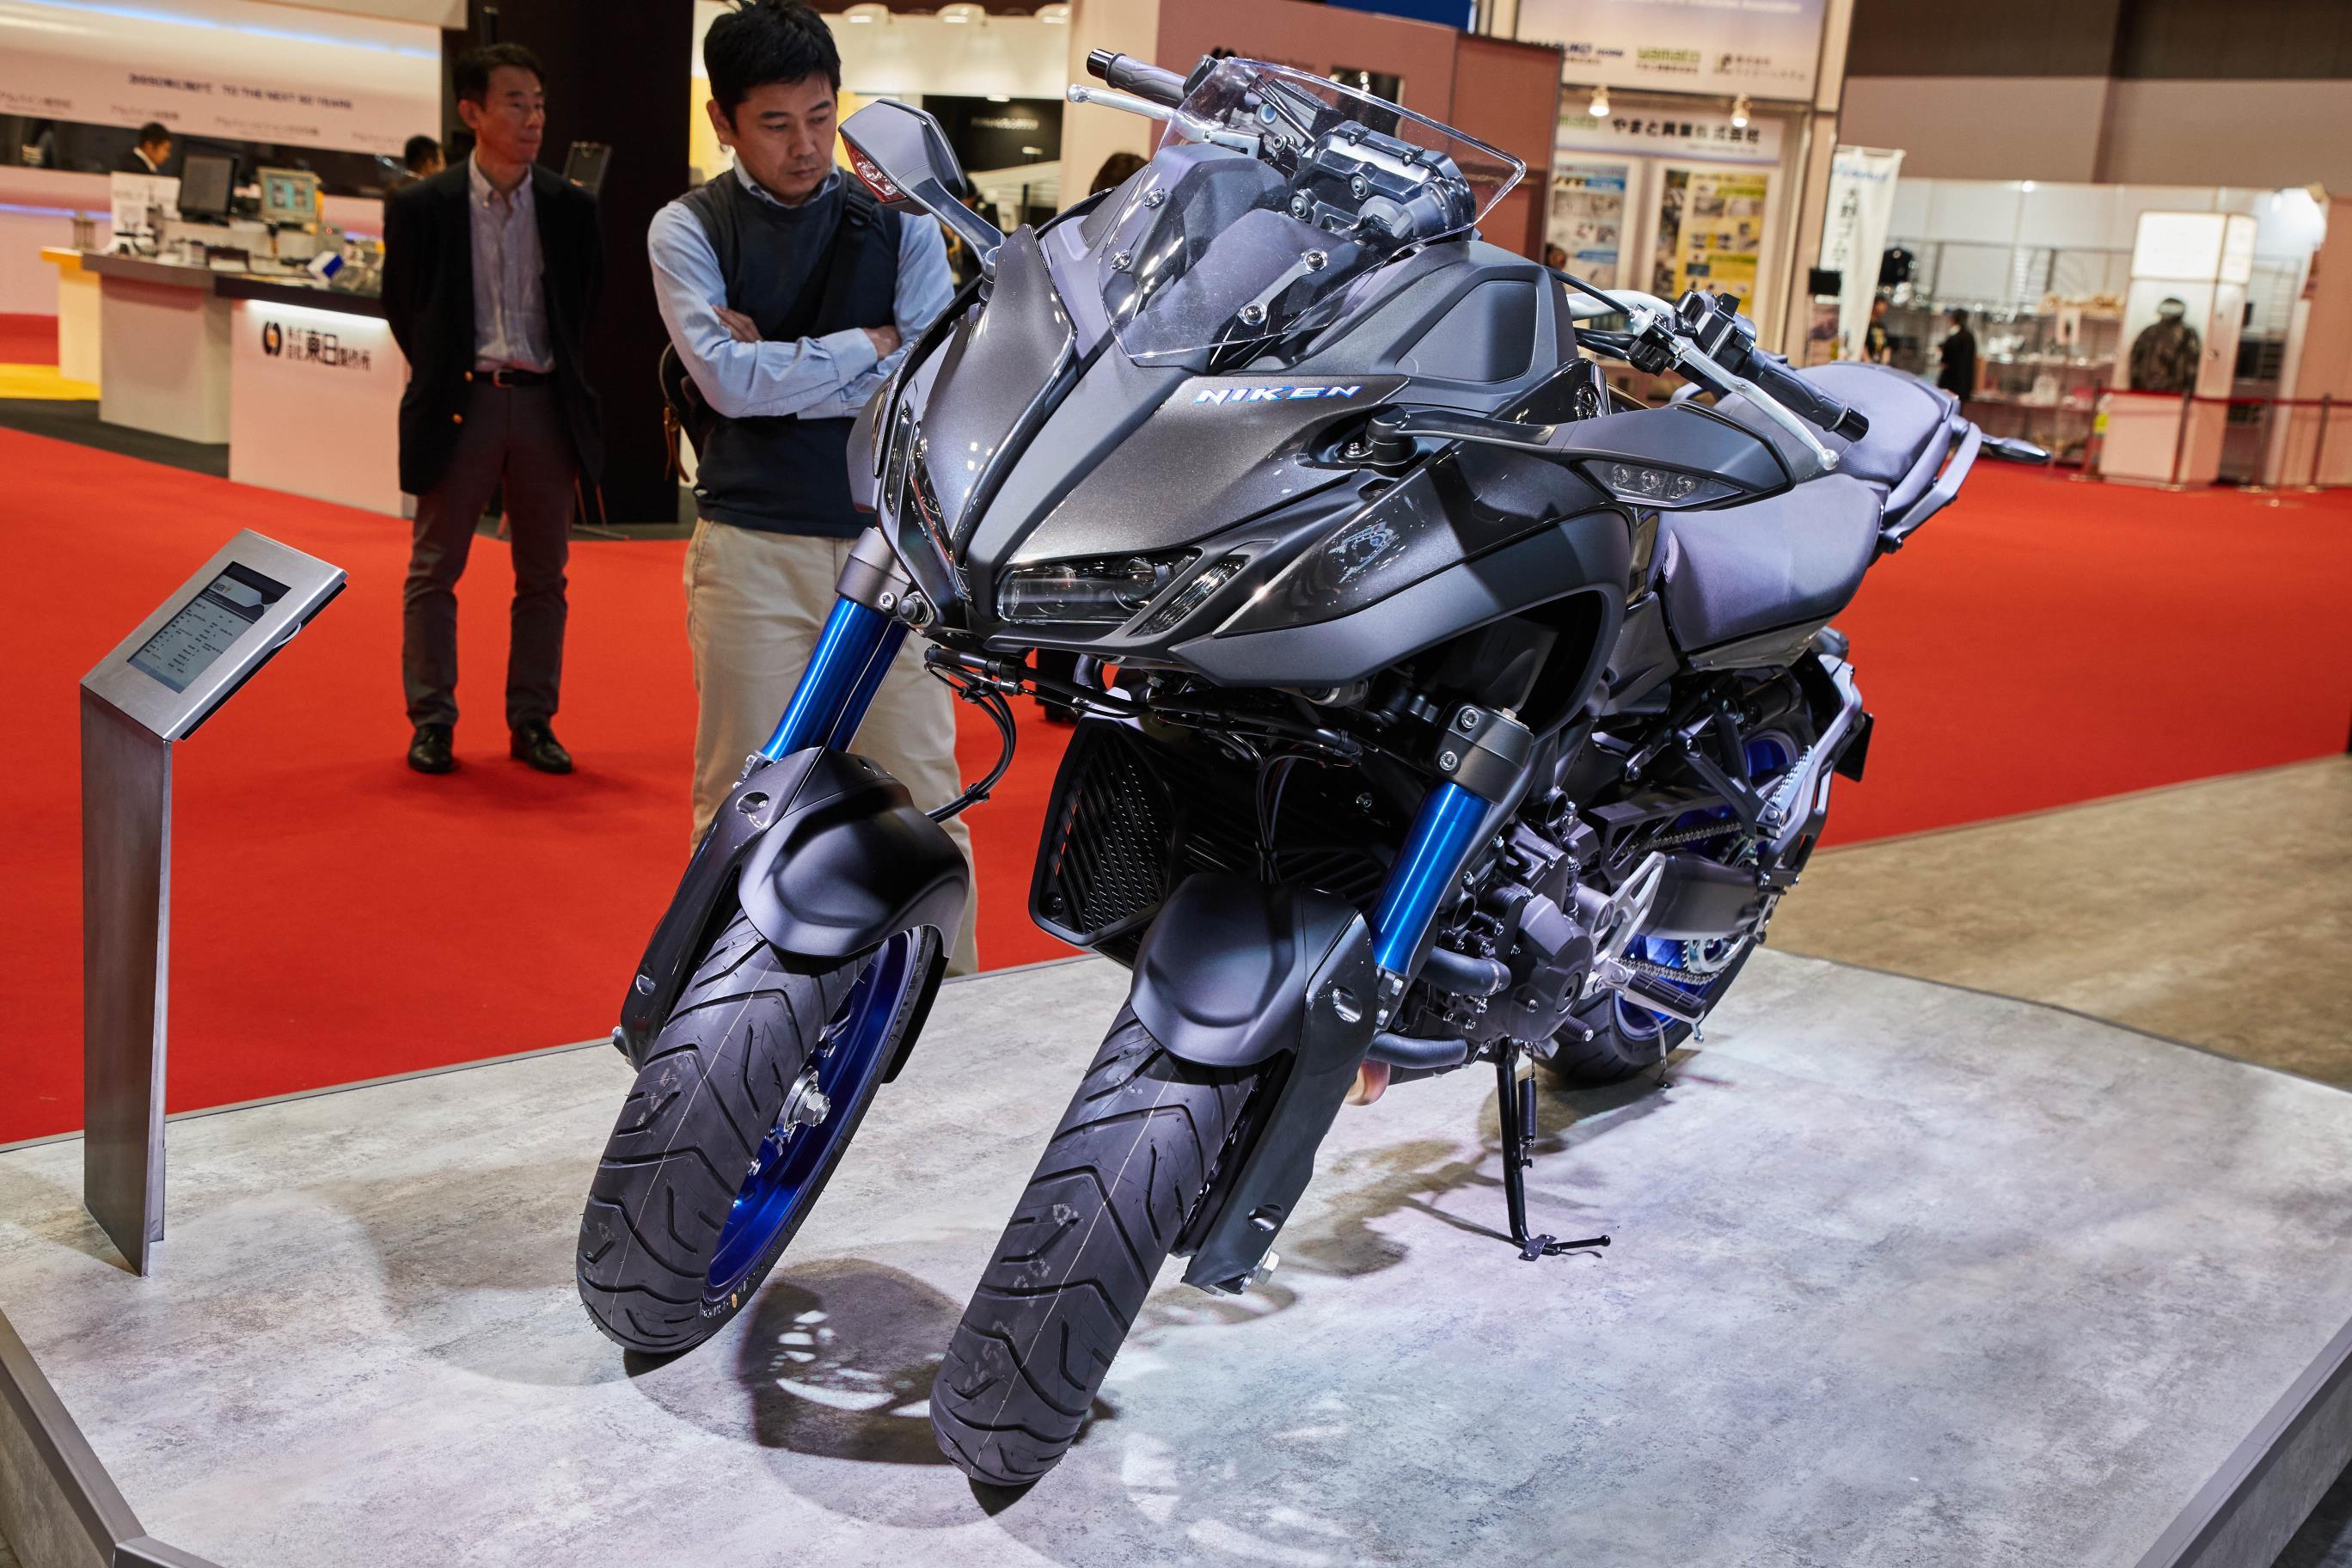 Tokyo motor show 2017 (105)